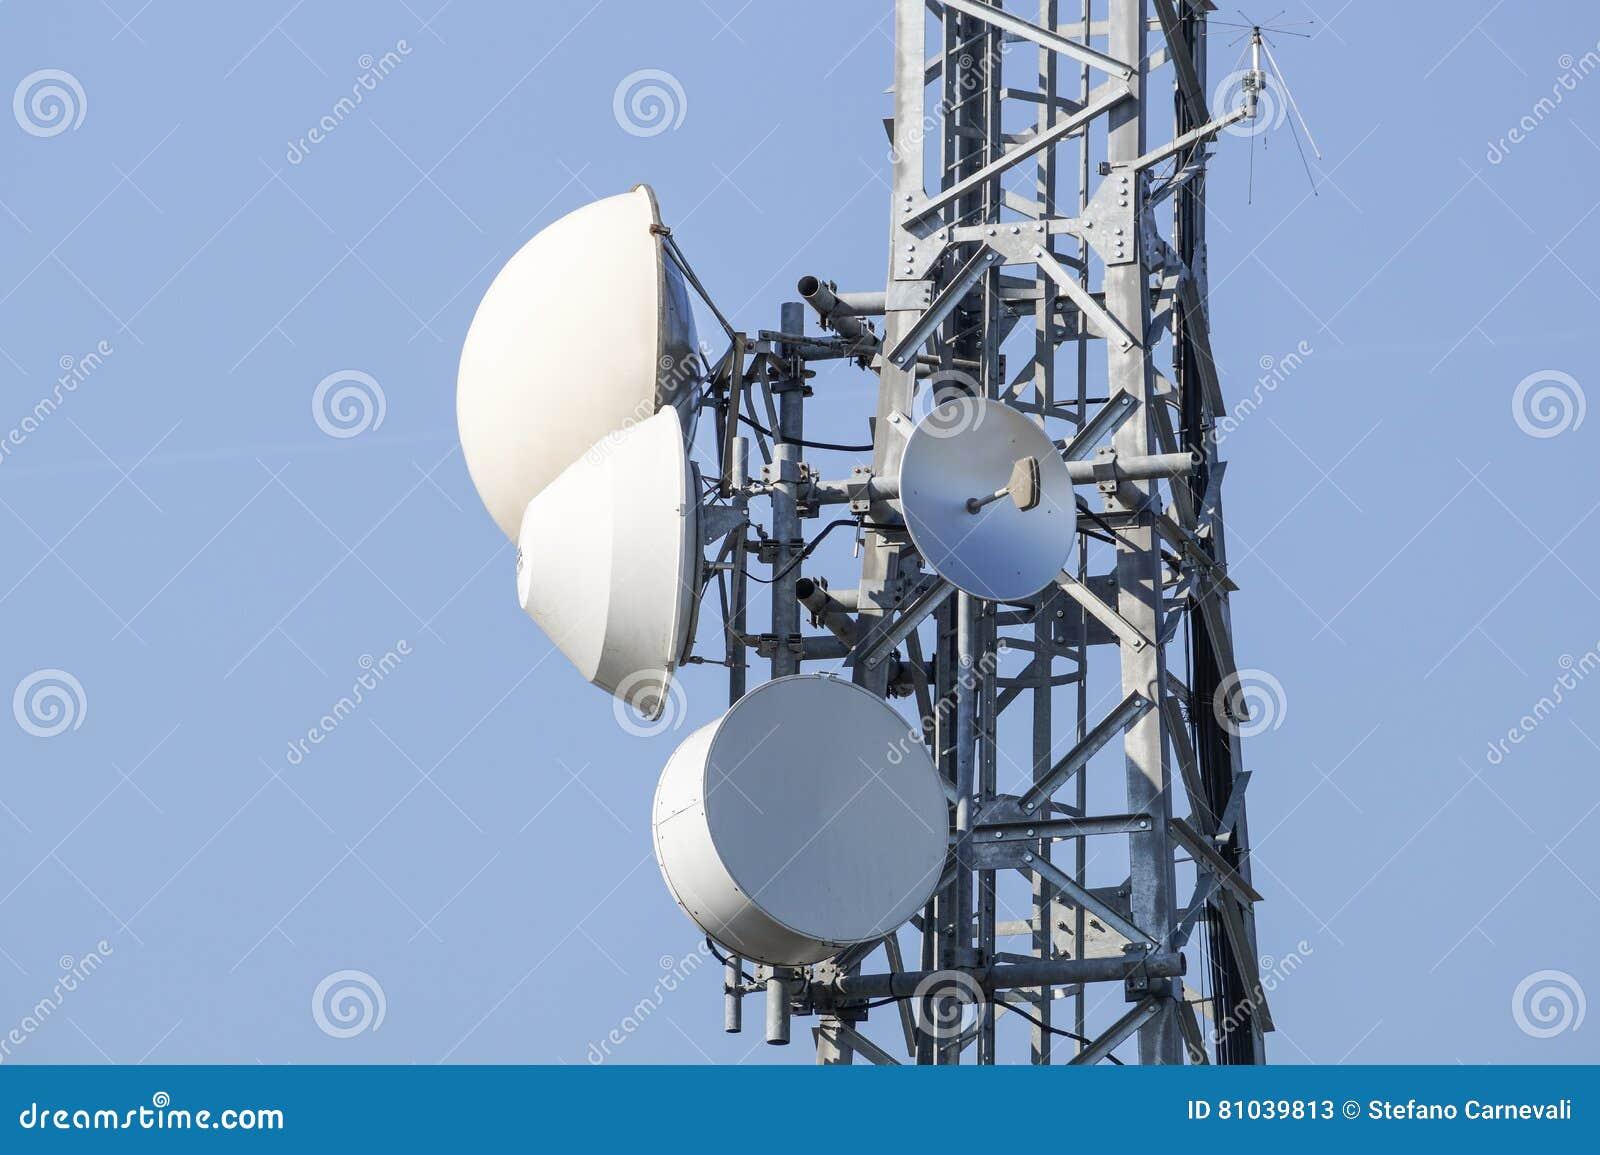 Storage radio communication, broadcasting and television antennas